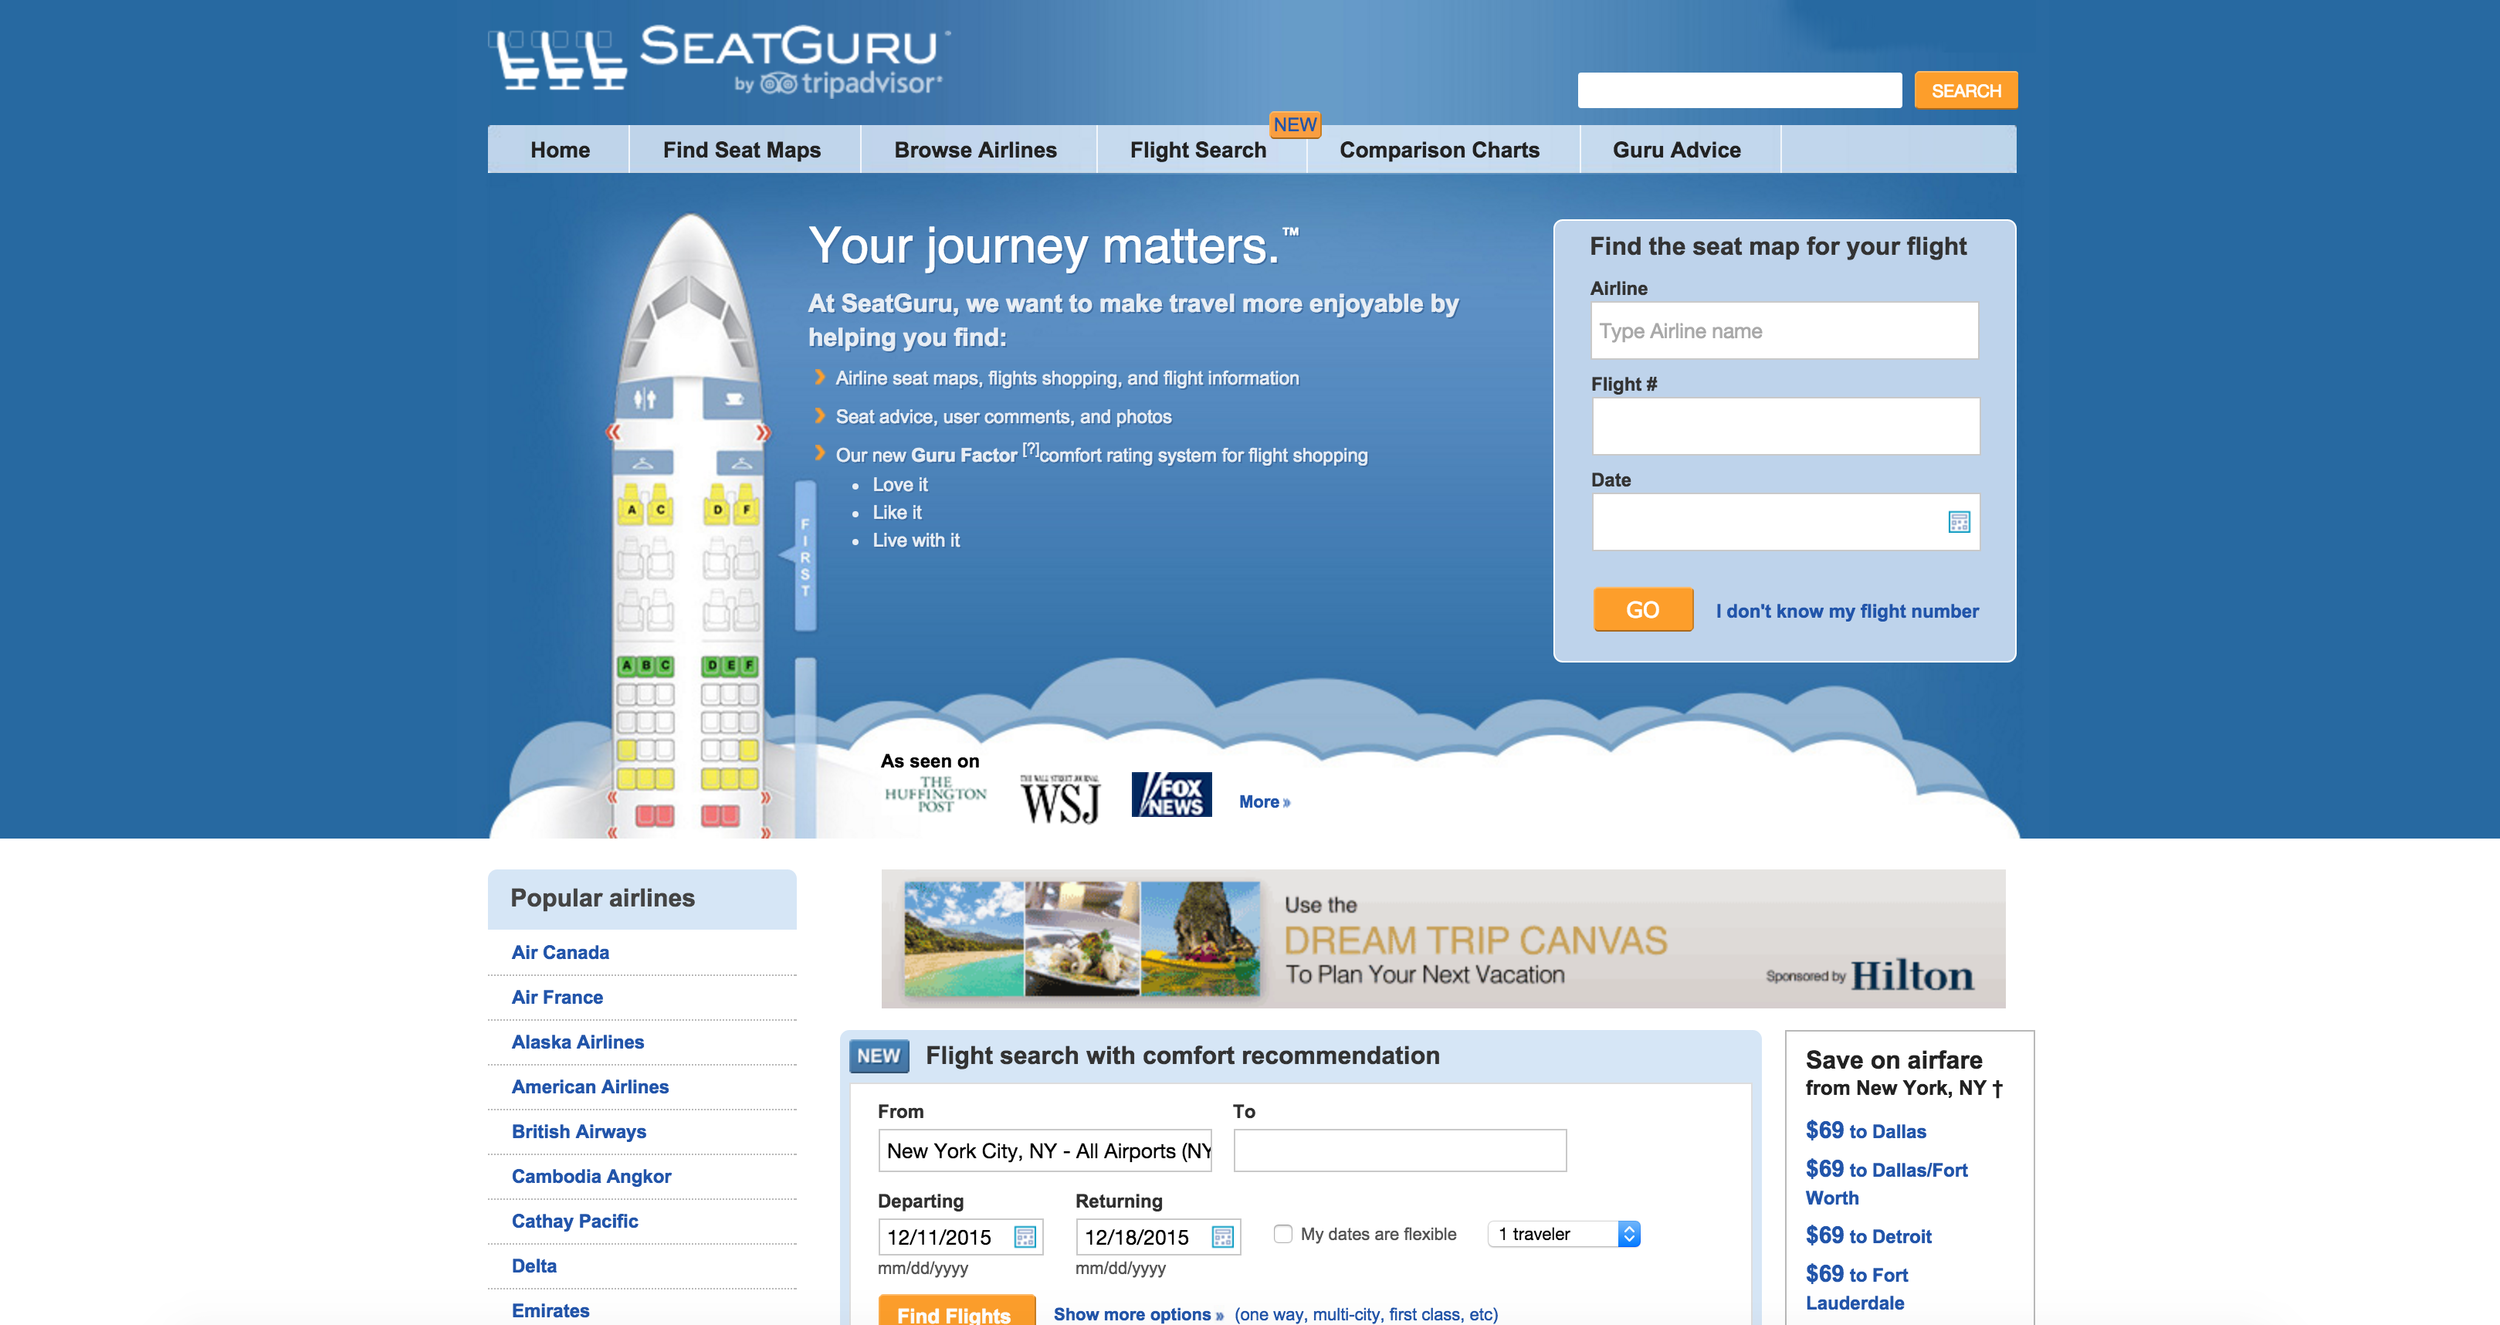 SEAT GURU FLIGHT MAP